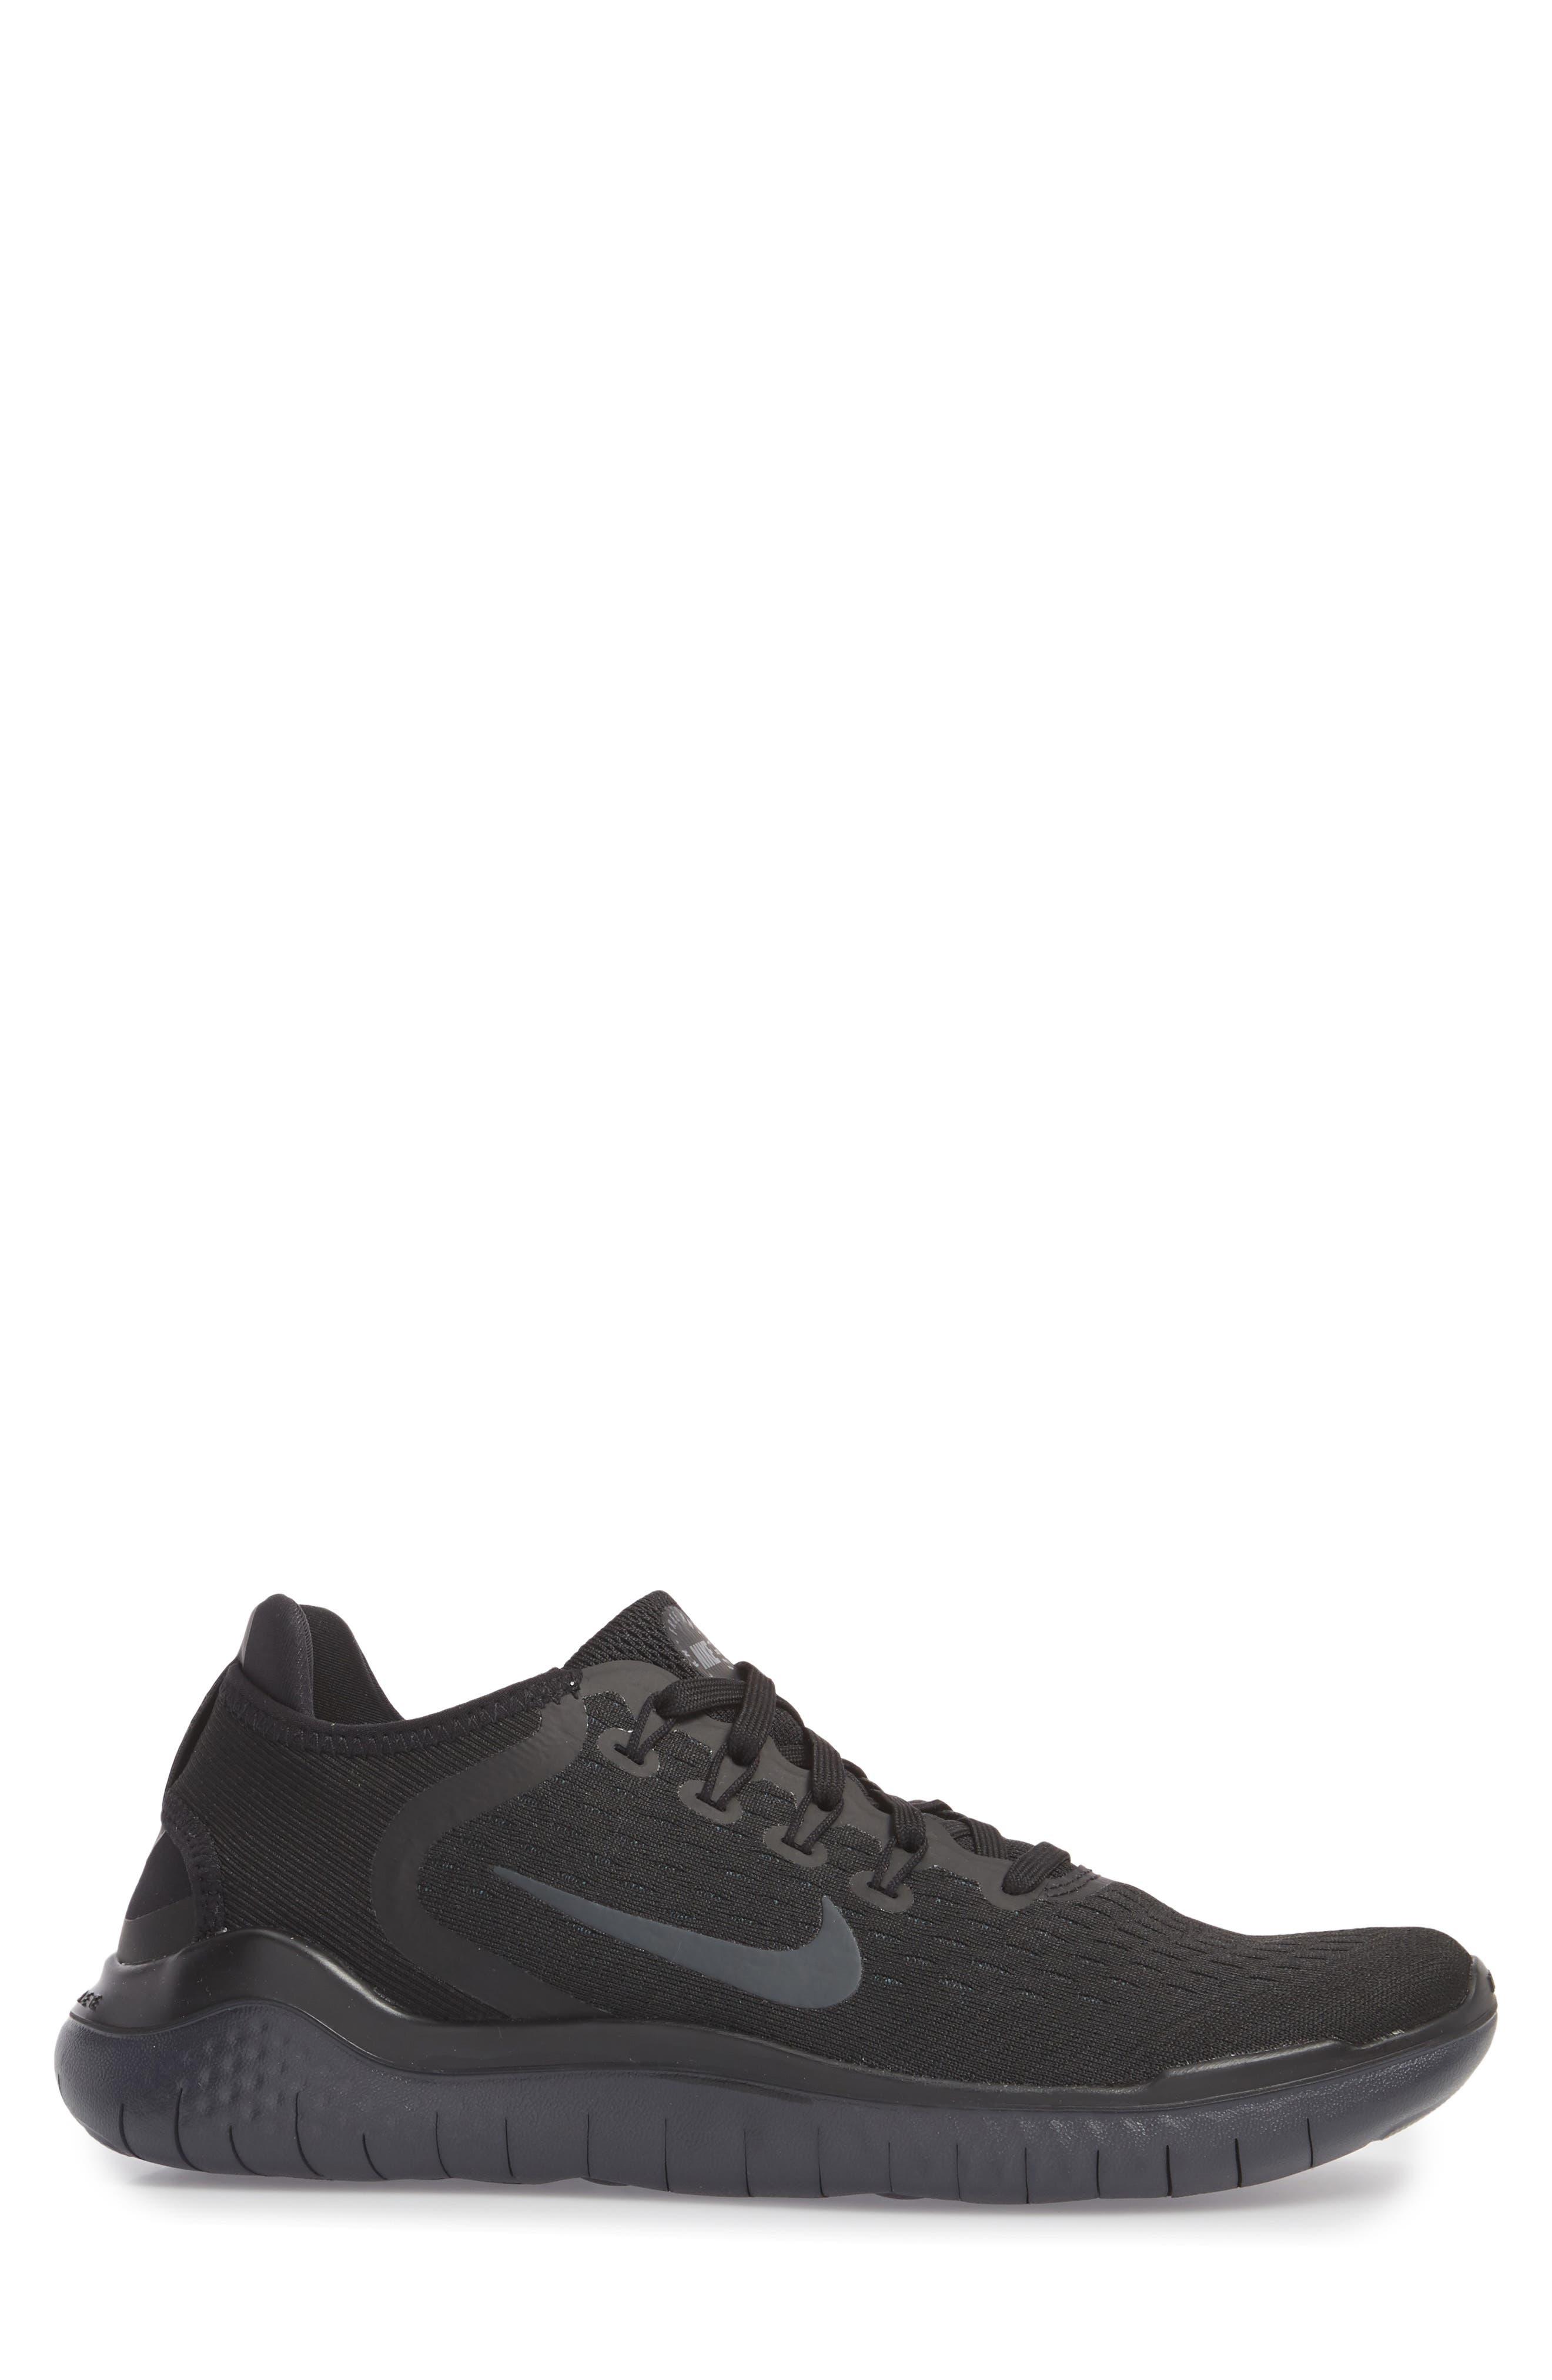 Free RN 2018 Running Shoe,                             Alternate thumbnail 3, color,                             Black/ Anthracite